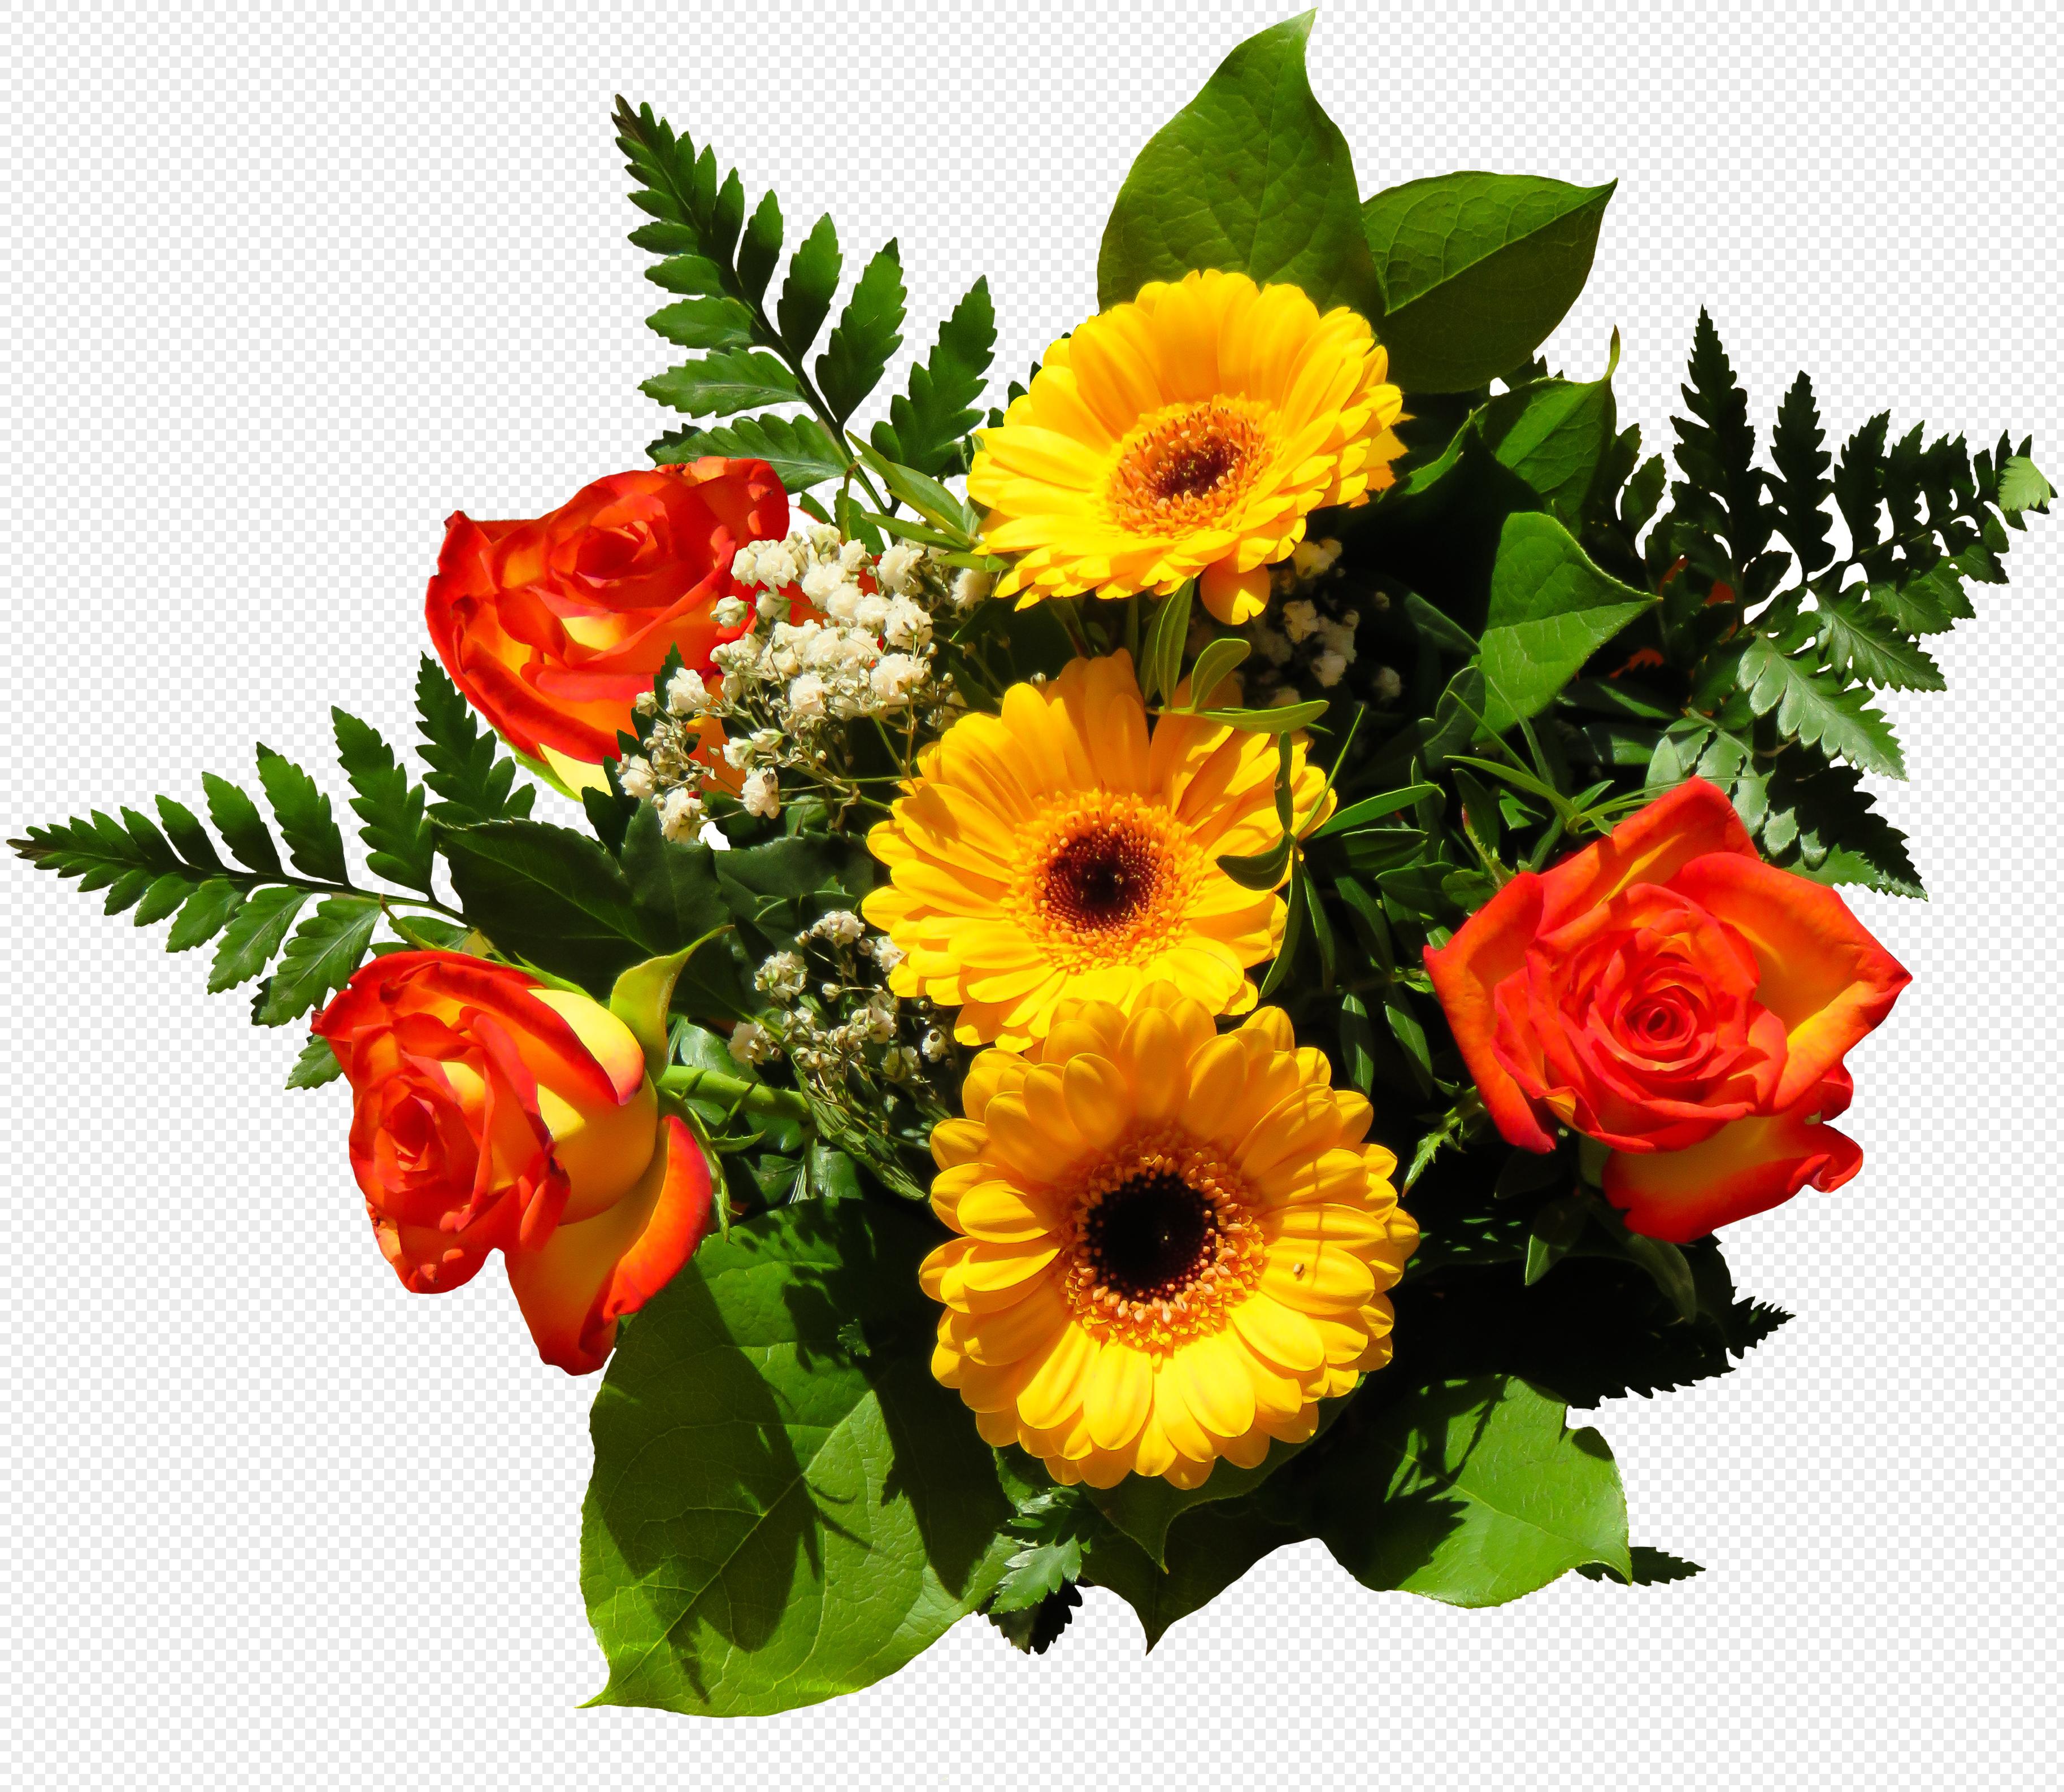 Hd decorative flowers bouquet materials png imagepicture free hd decorative flowers bouquet materials izmirmasajfo